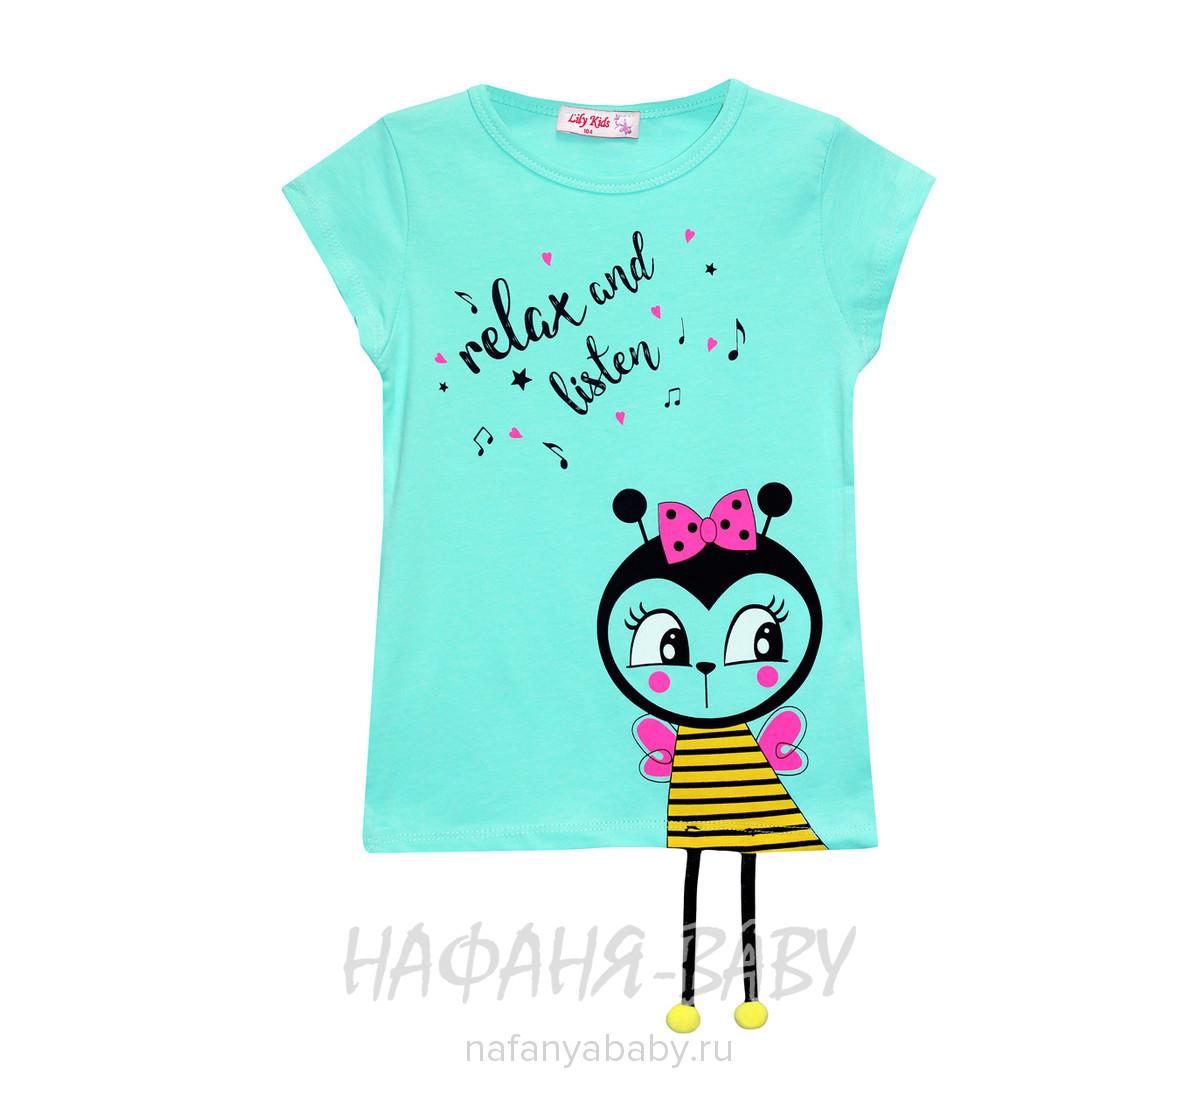 Детская футболка LILY Kids арт: 3582, 1-4 года, оптом Турция